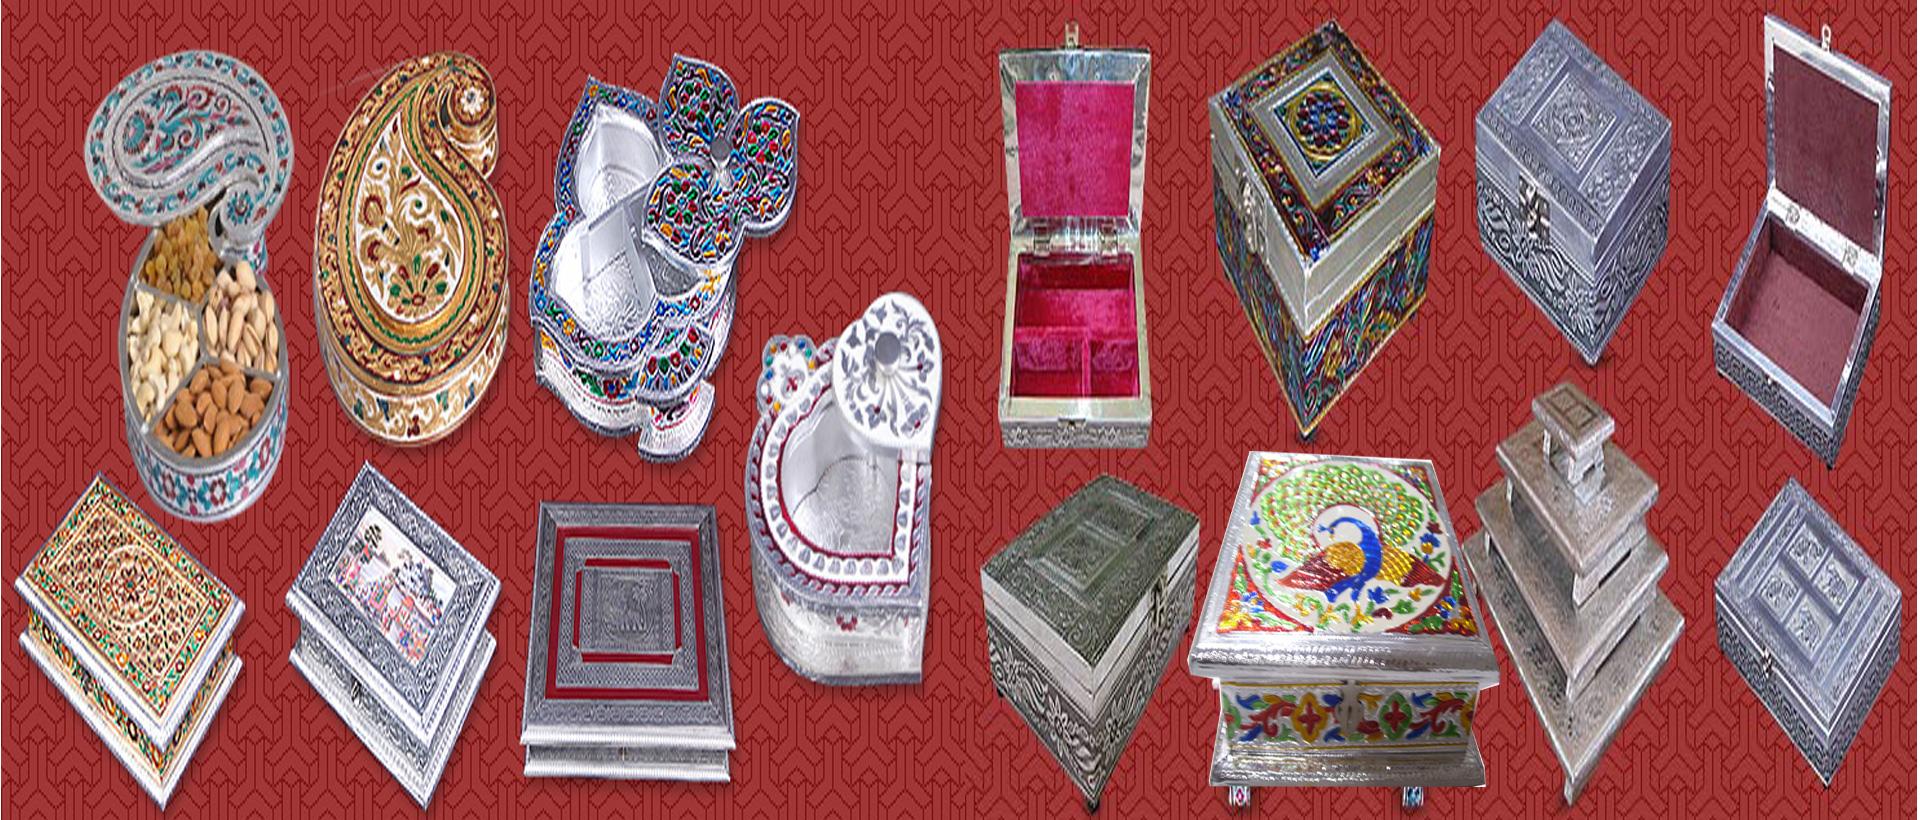 ALUMINIUM WOODEN GIFT BOXES